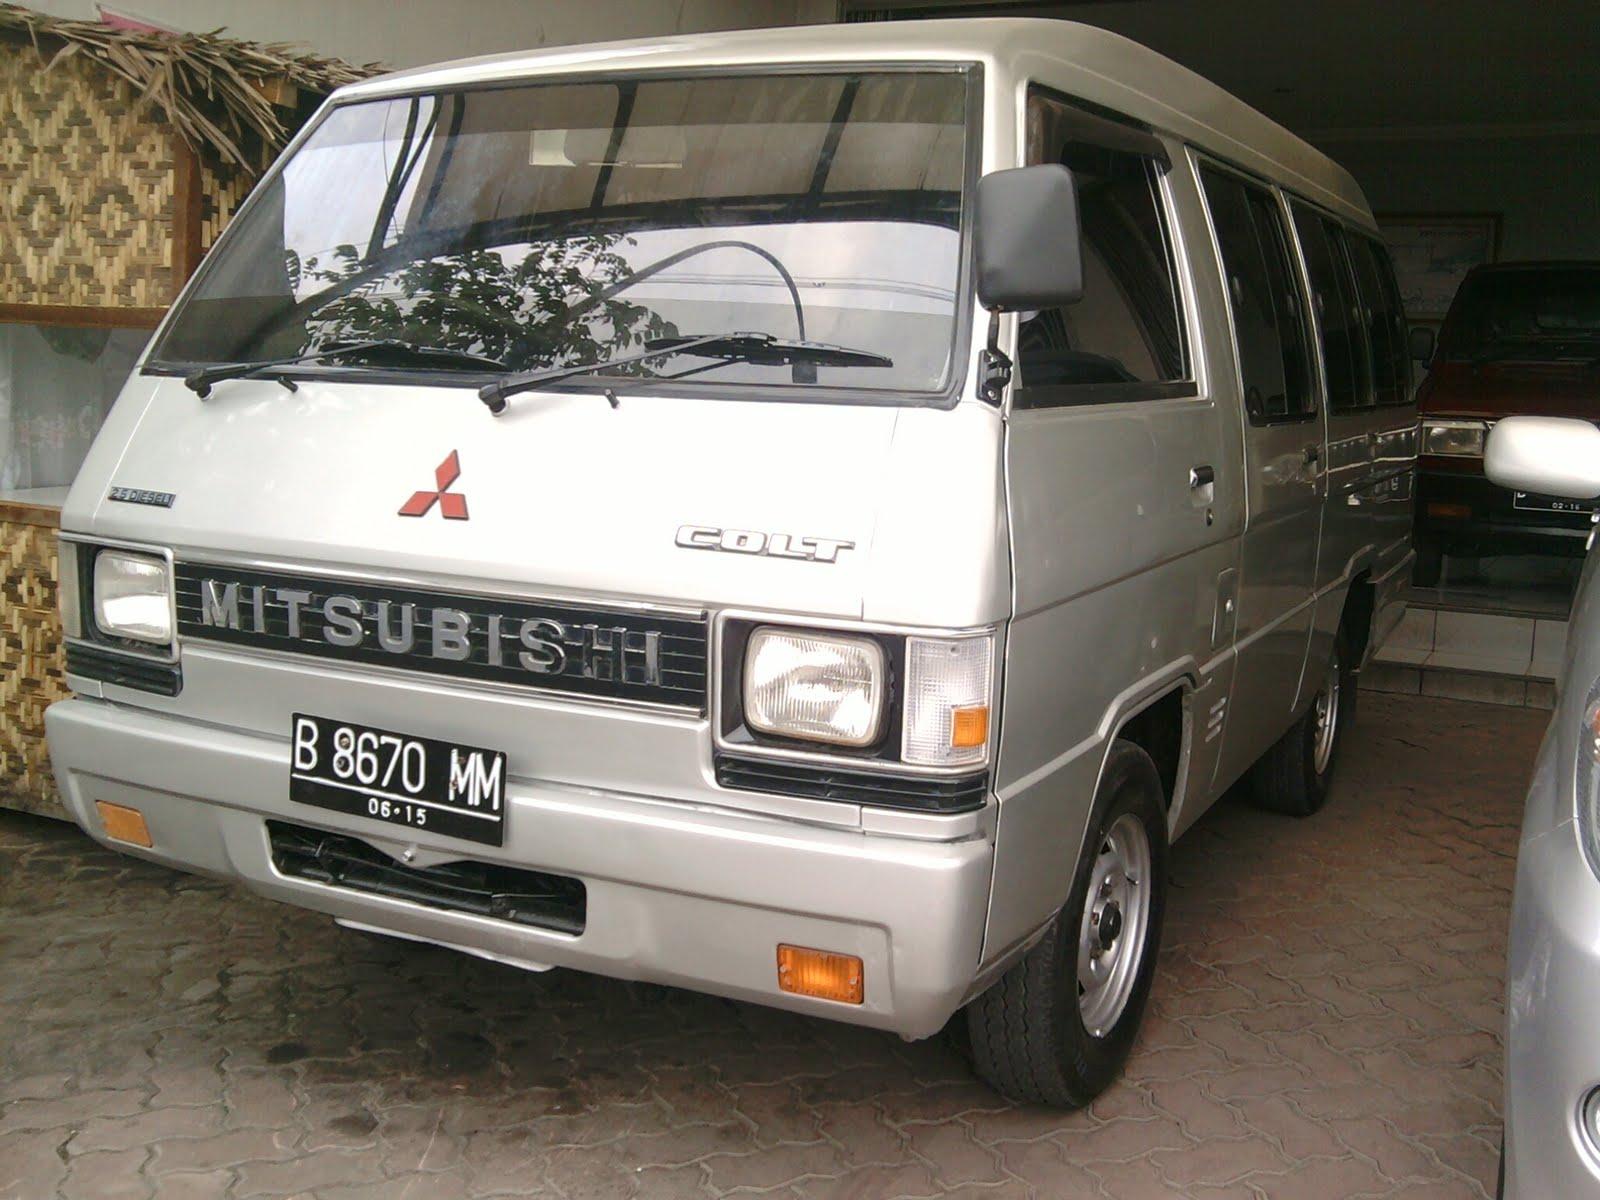 SIMPATI MOTOR Tangerang: Jual Mitsubishi L300 Minibus 2.5